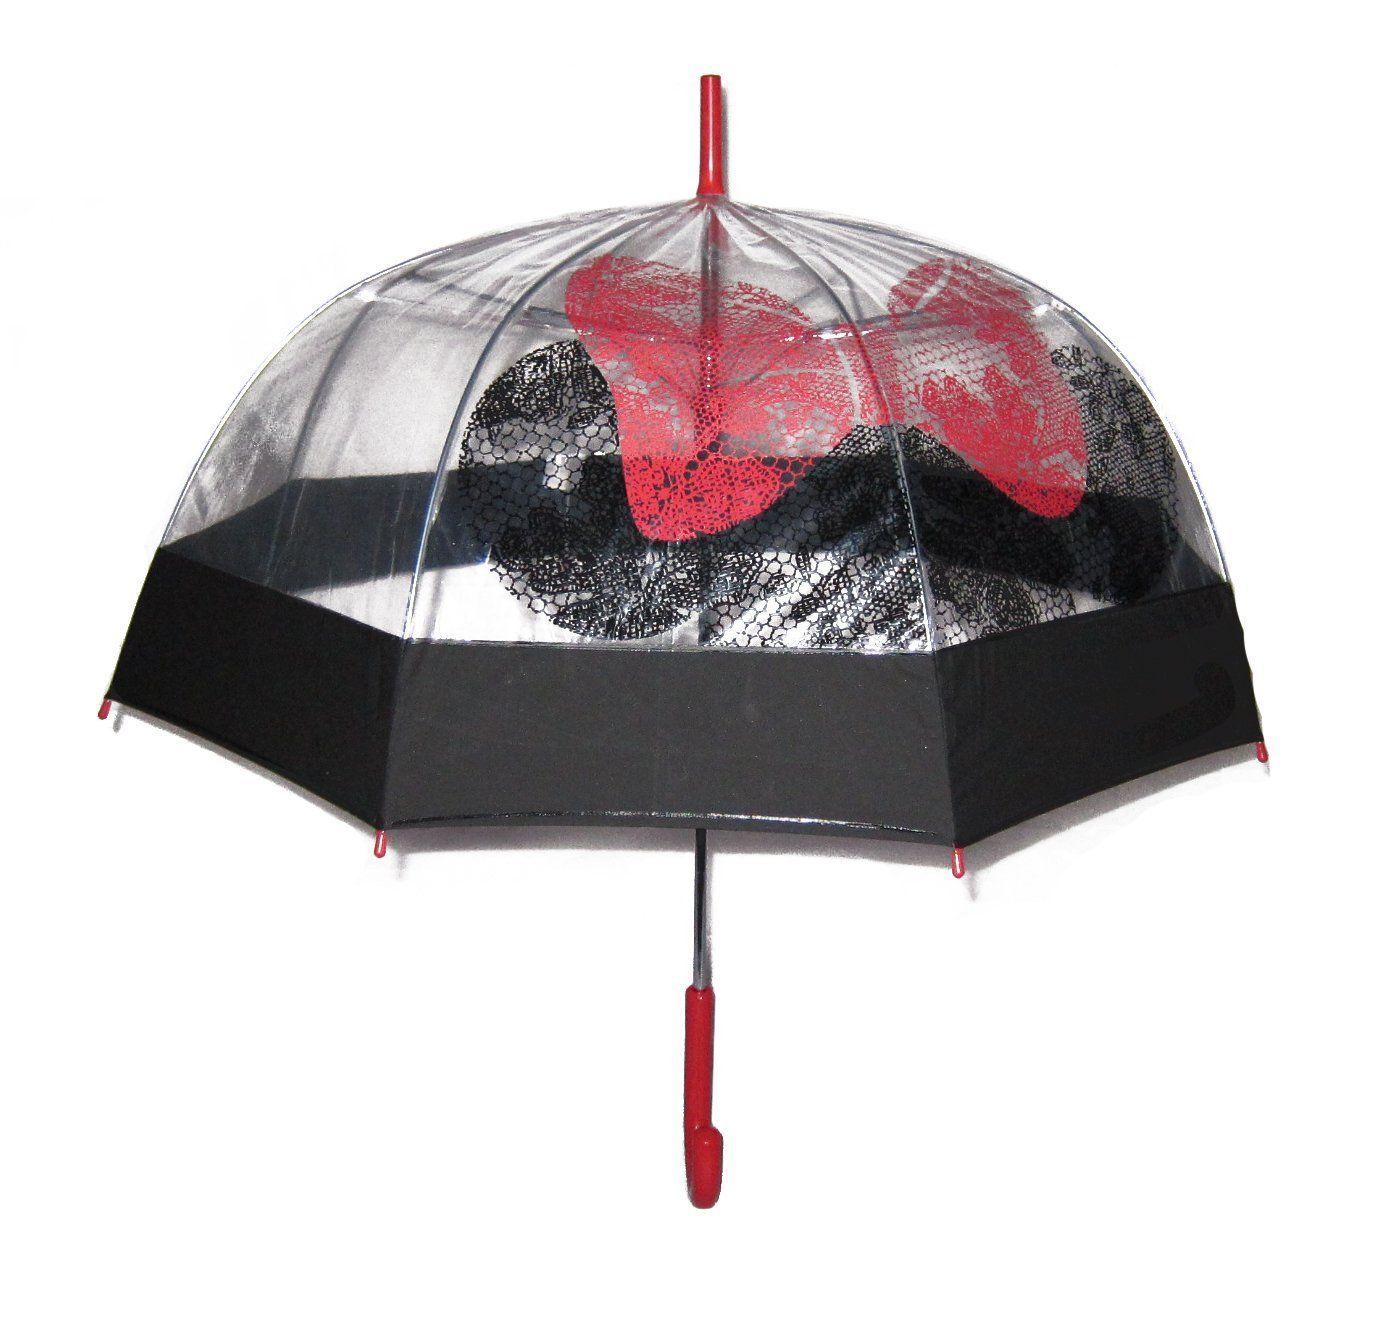 17aae00e03db5 Disney Minnie Mouse Umbrella - Adult Size: - from Amazon. $16 + $7 ...